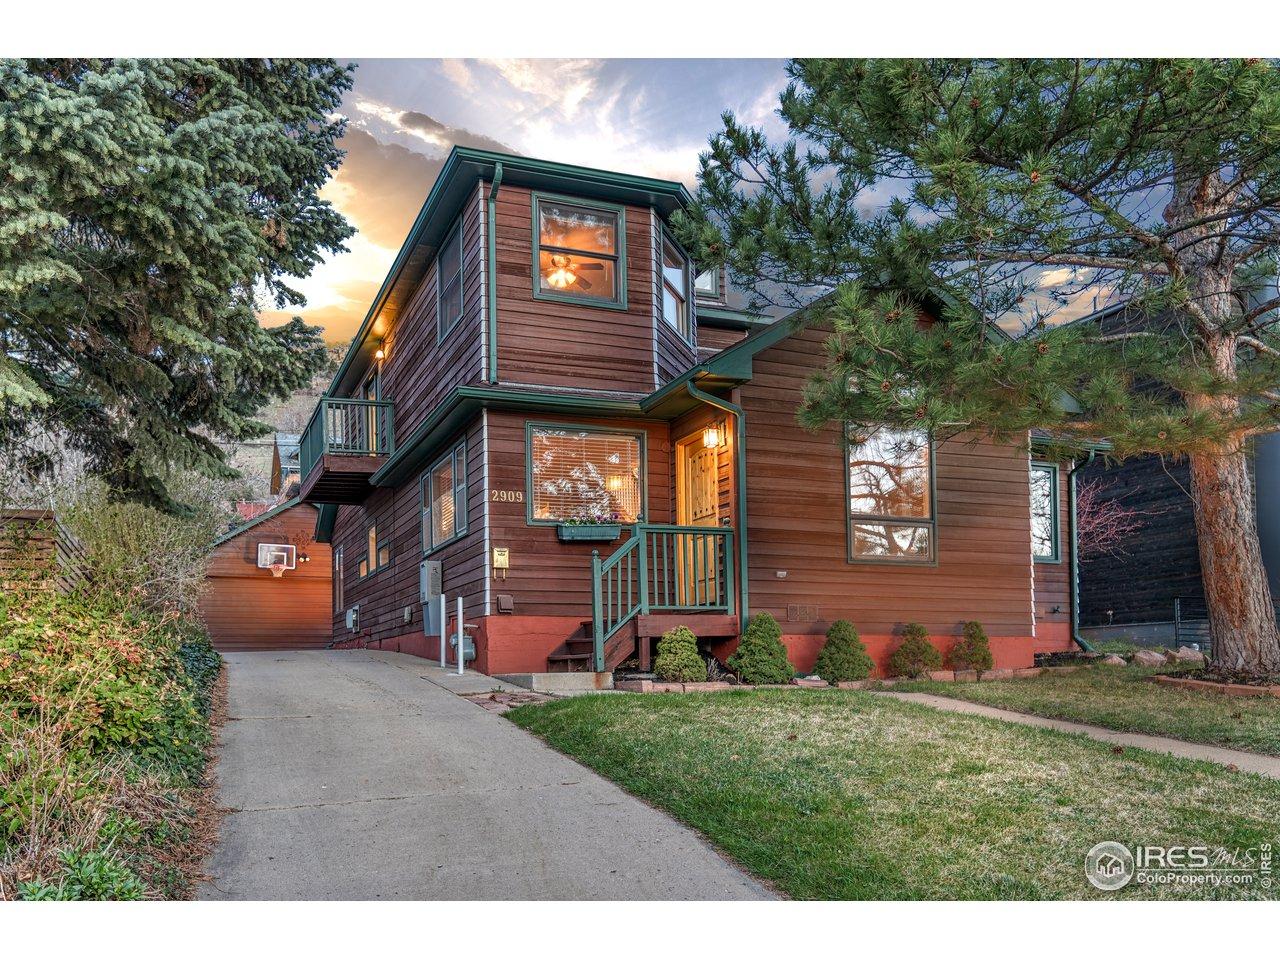 2909 4th St, Boulder CO 80304